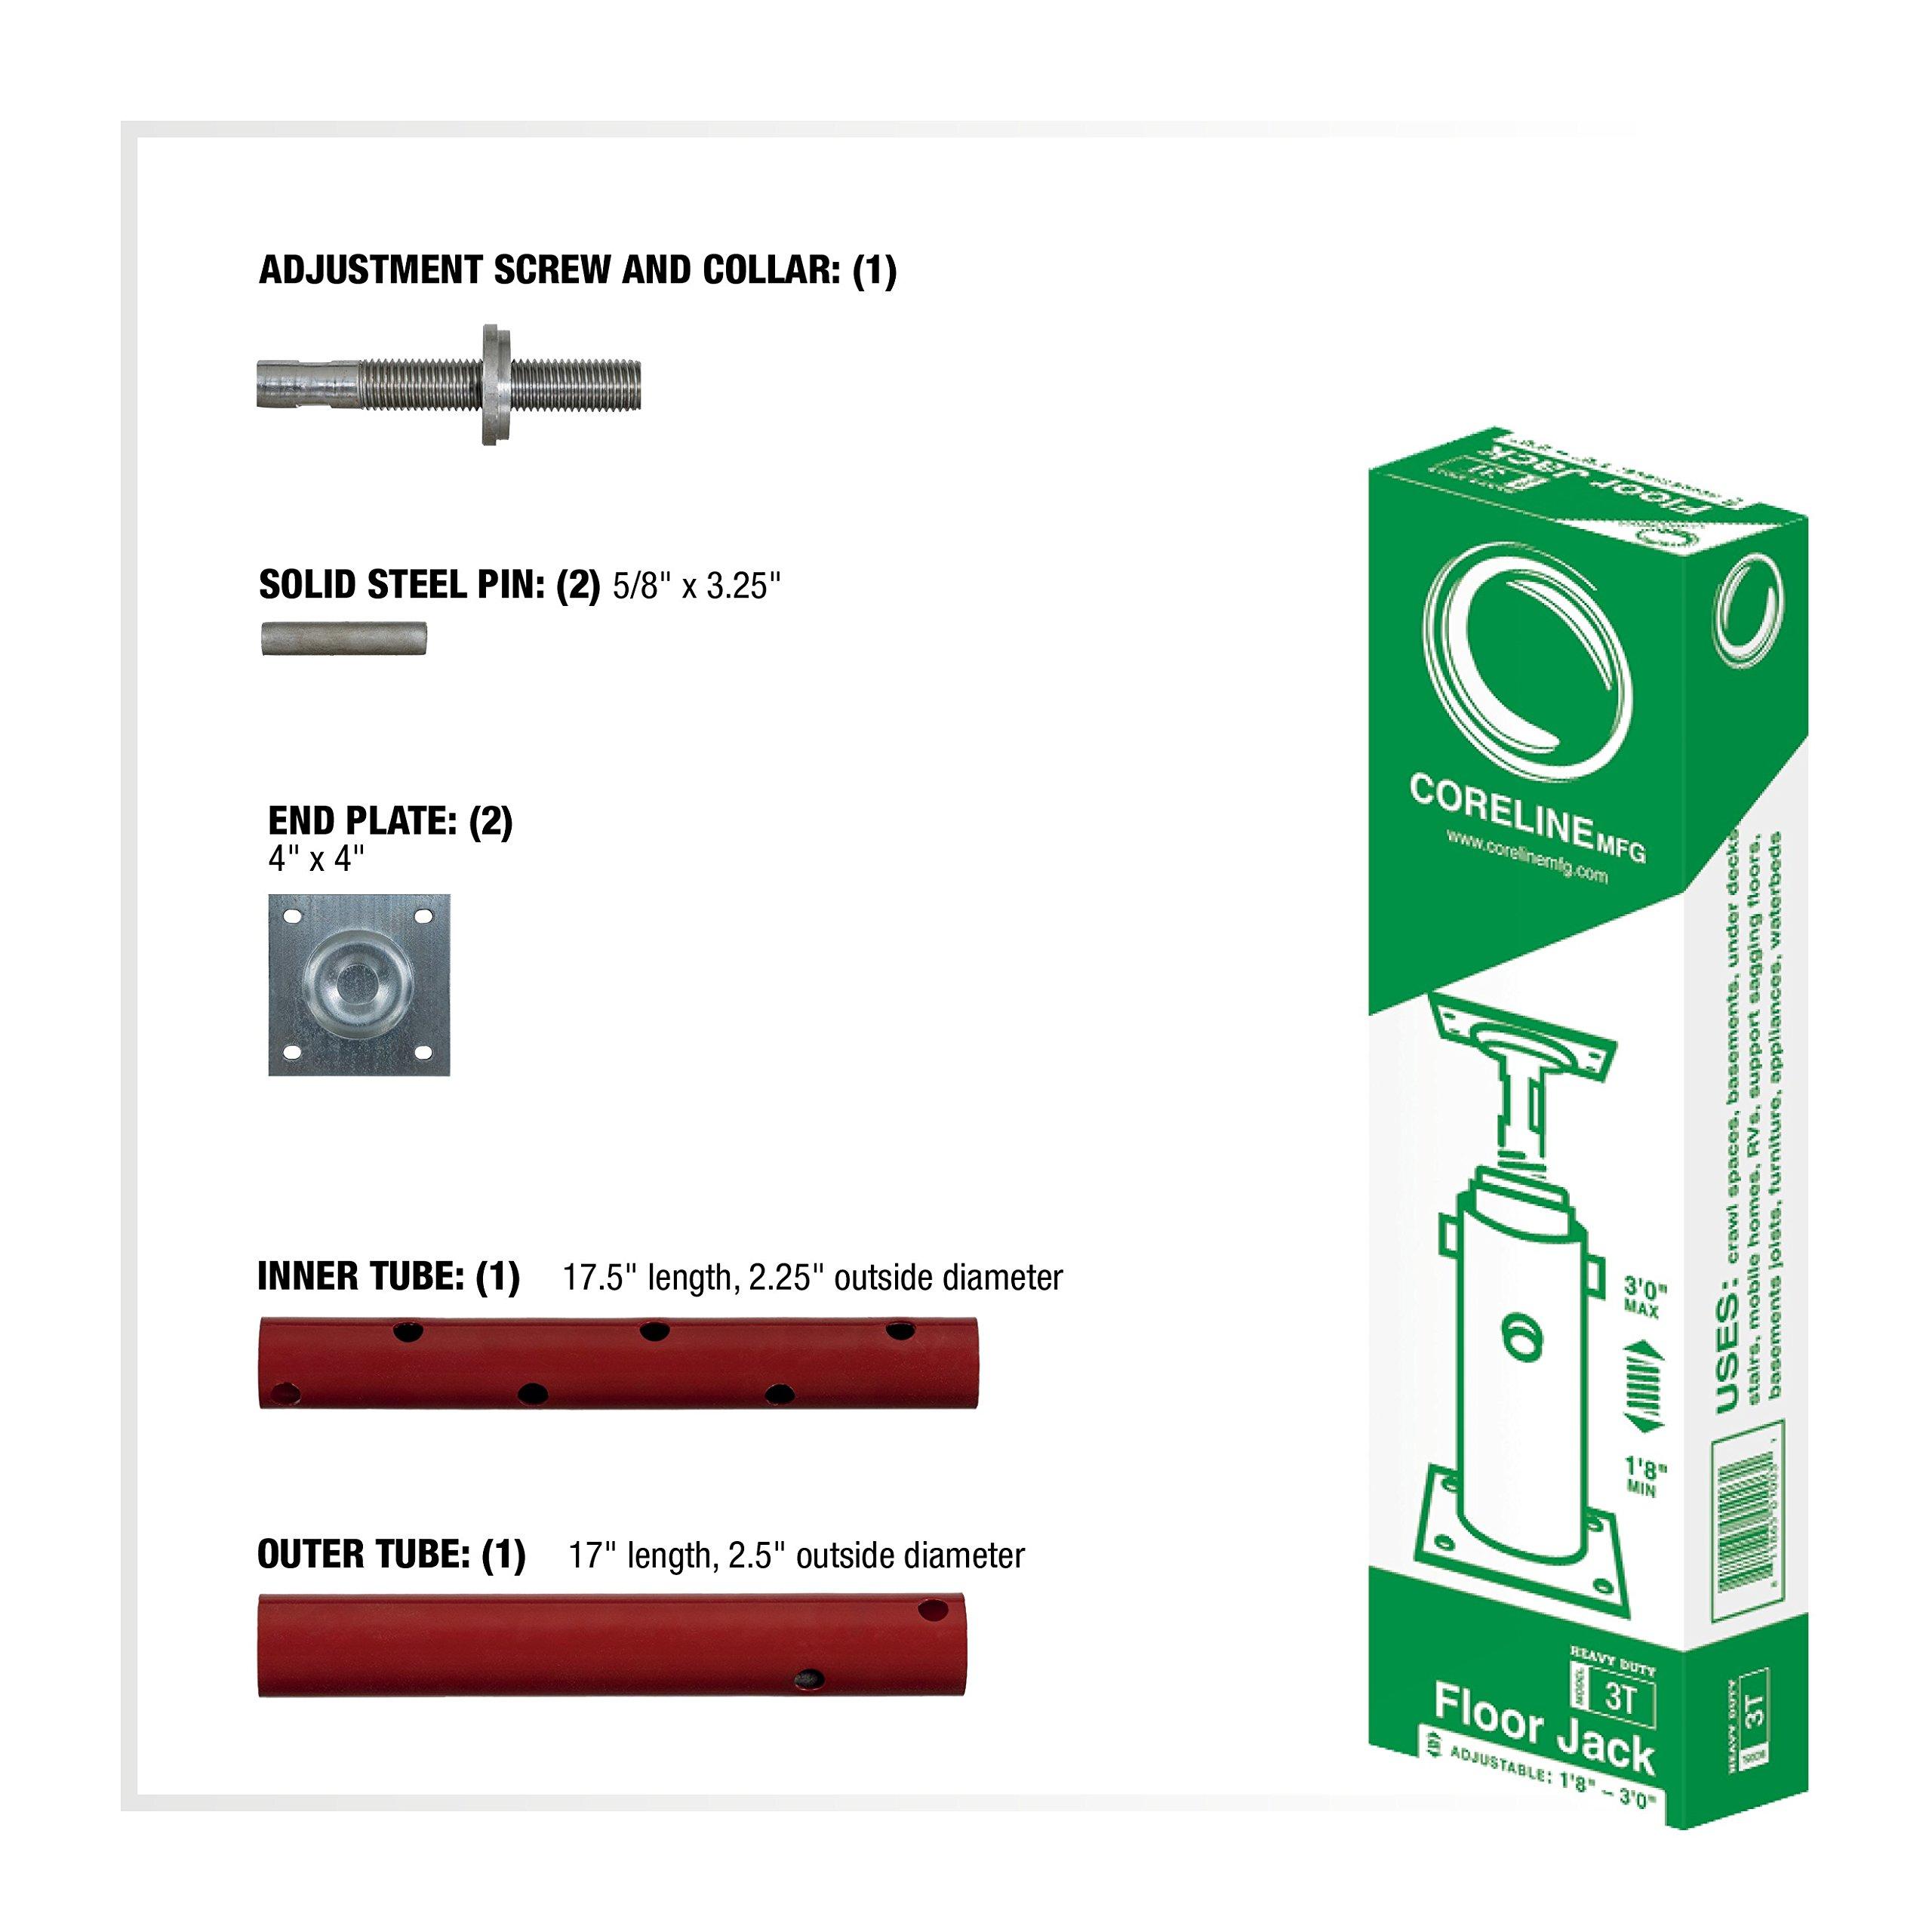 Grow Co. Adjustable Floor Jack - 17,500-Lb. Capacity, Model# 3T by CORELINE (Image #2)